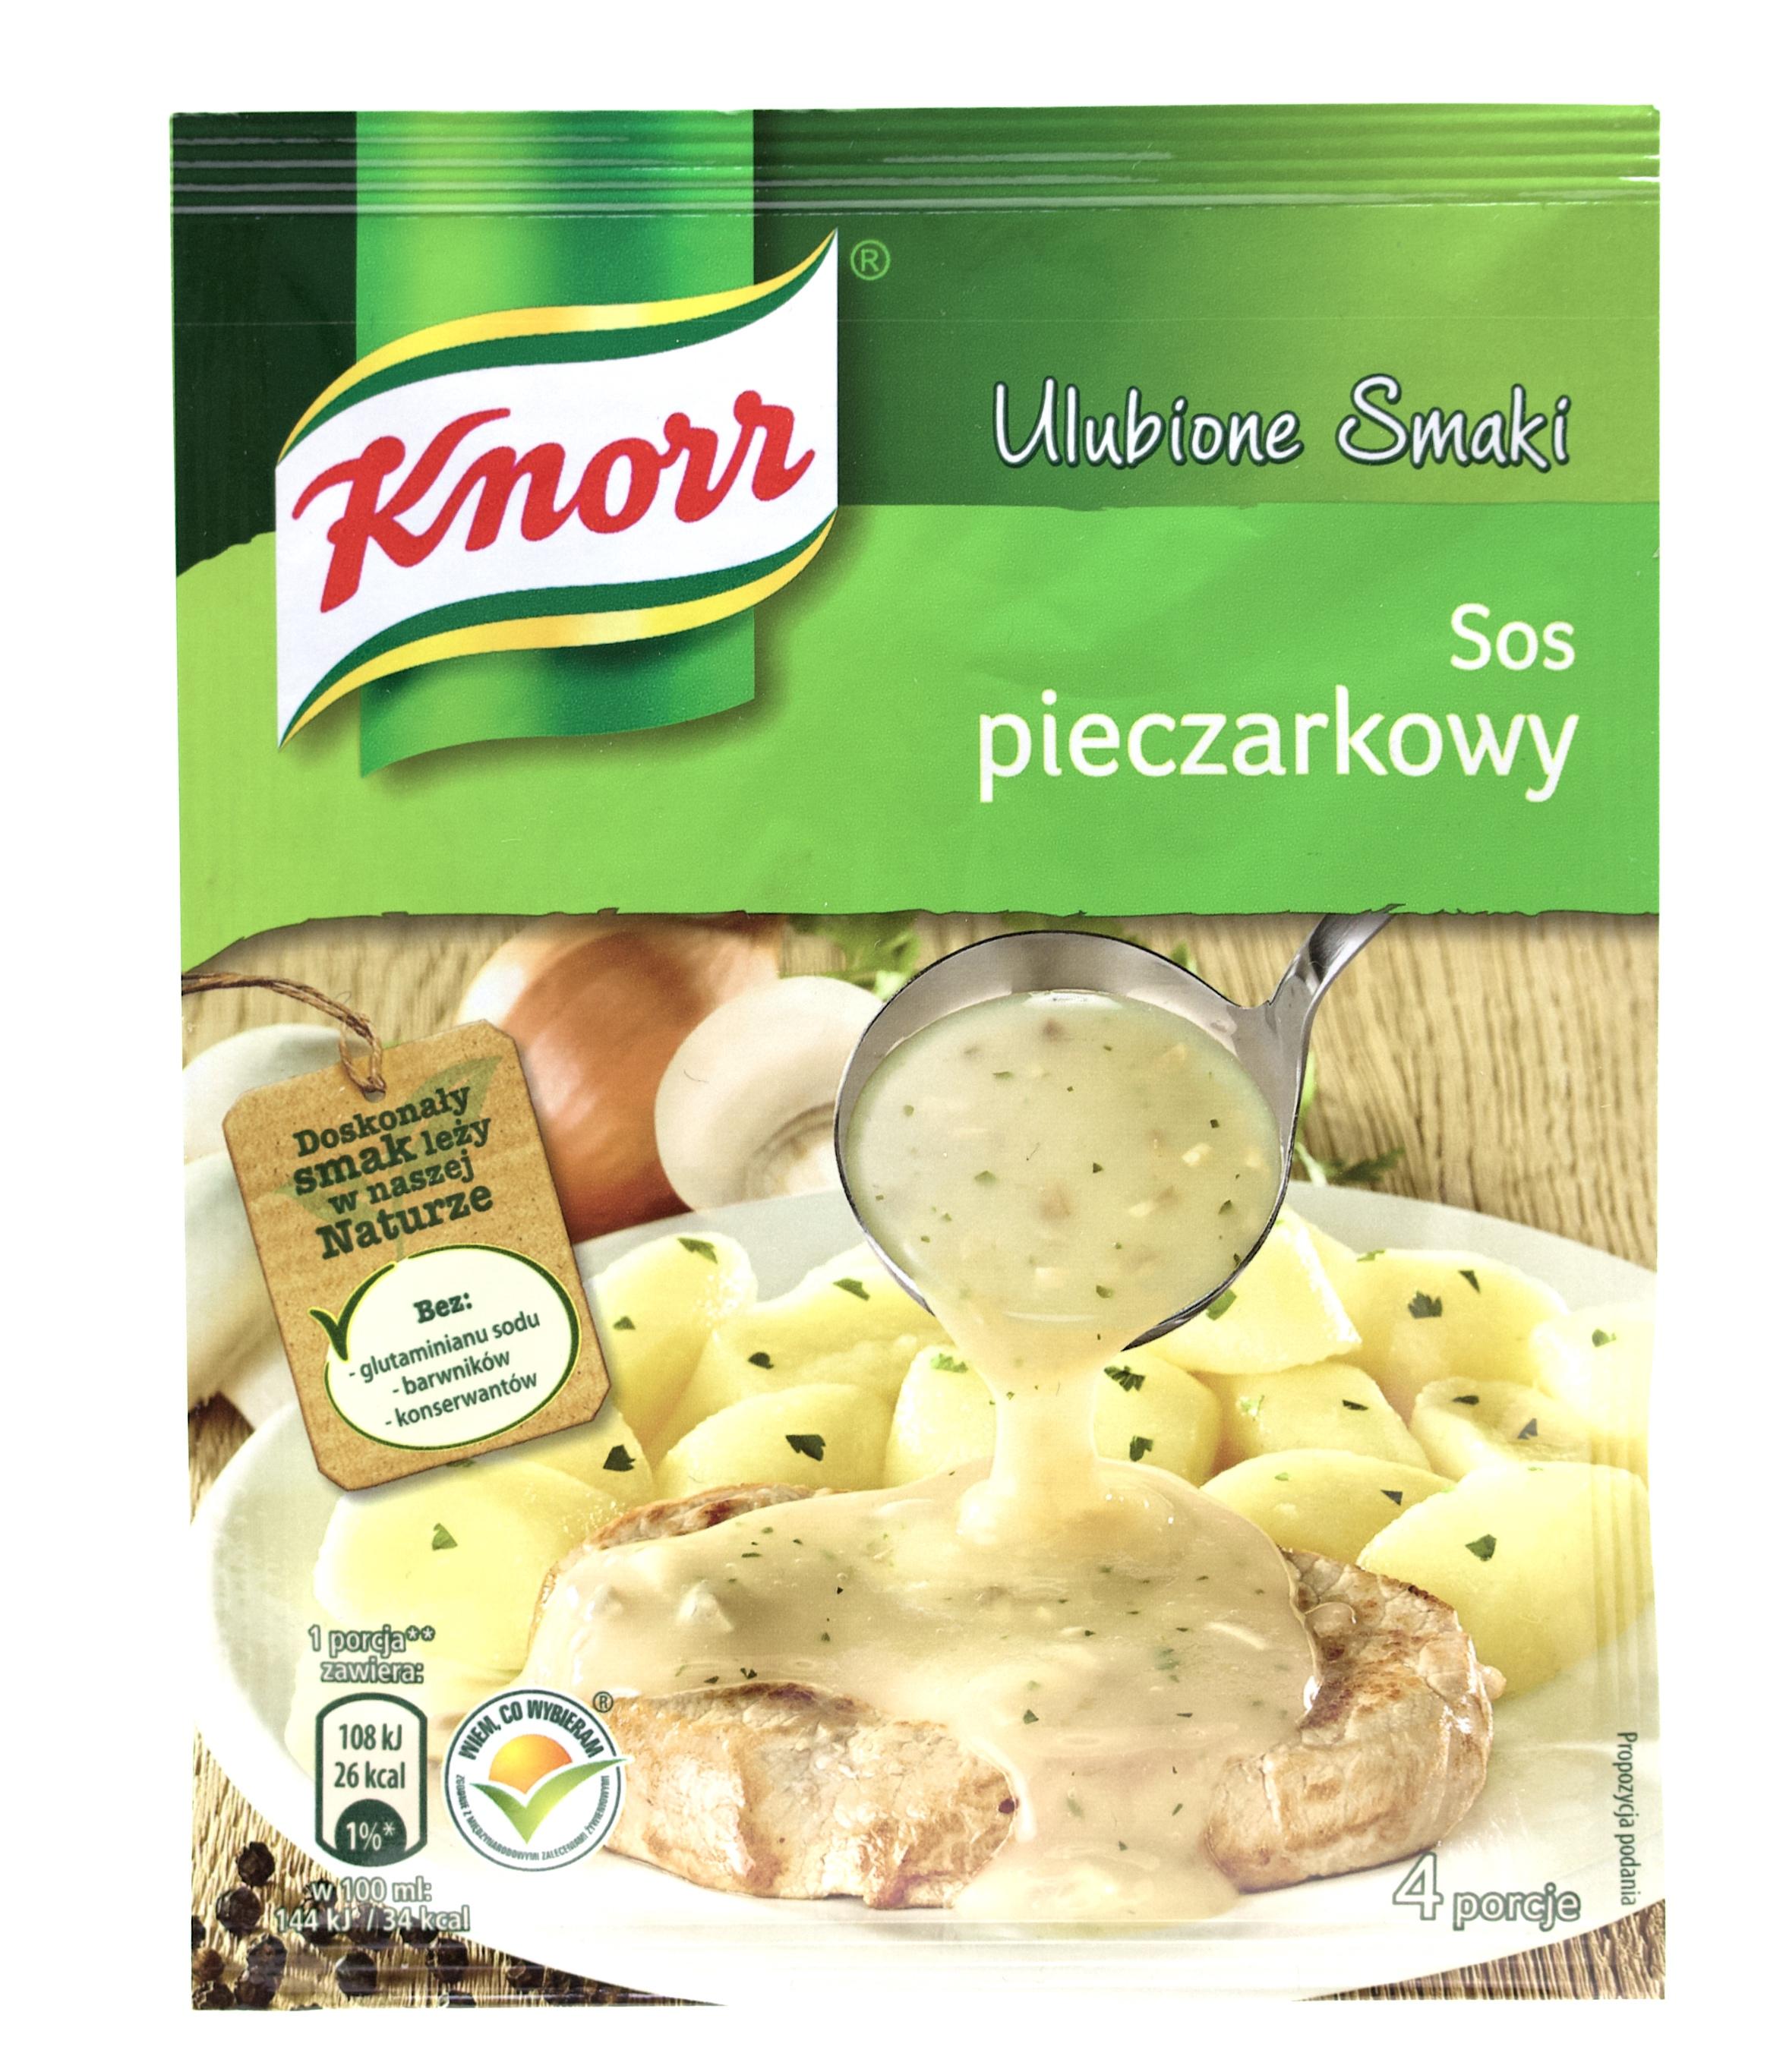 Knorr Champignonsauce - Polnische Lebensmittel bei Waldfurter